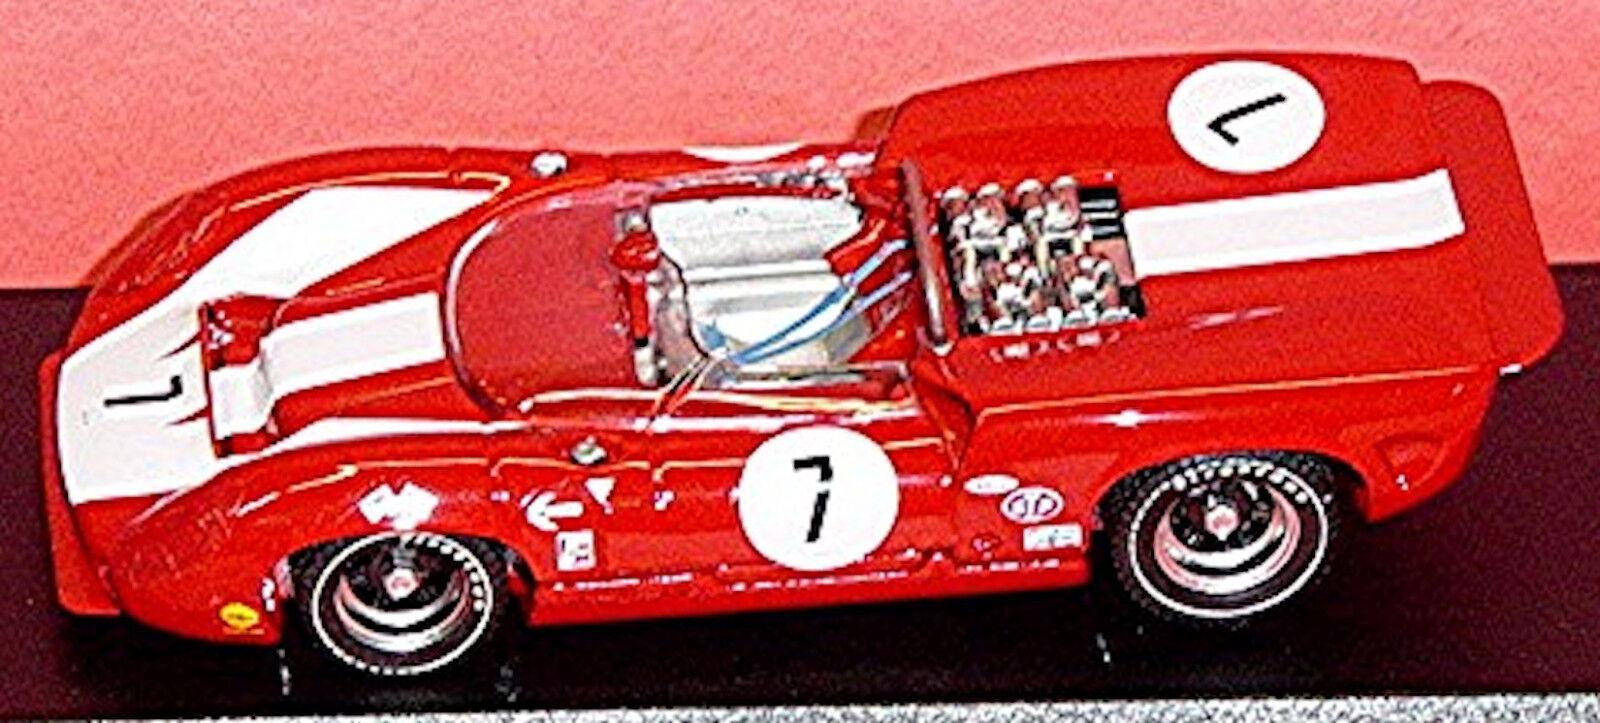 Lola t70 Spyder Riverside 1966 7  7 1966 John Surtees 1 43 Best fb5879